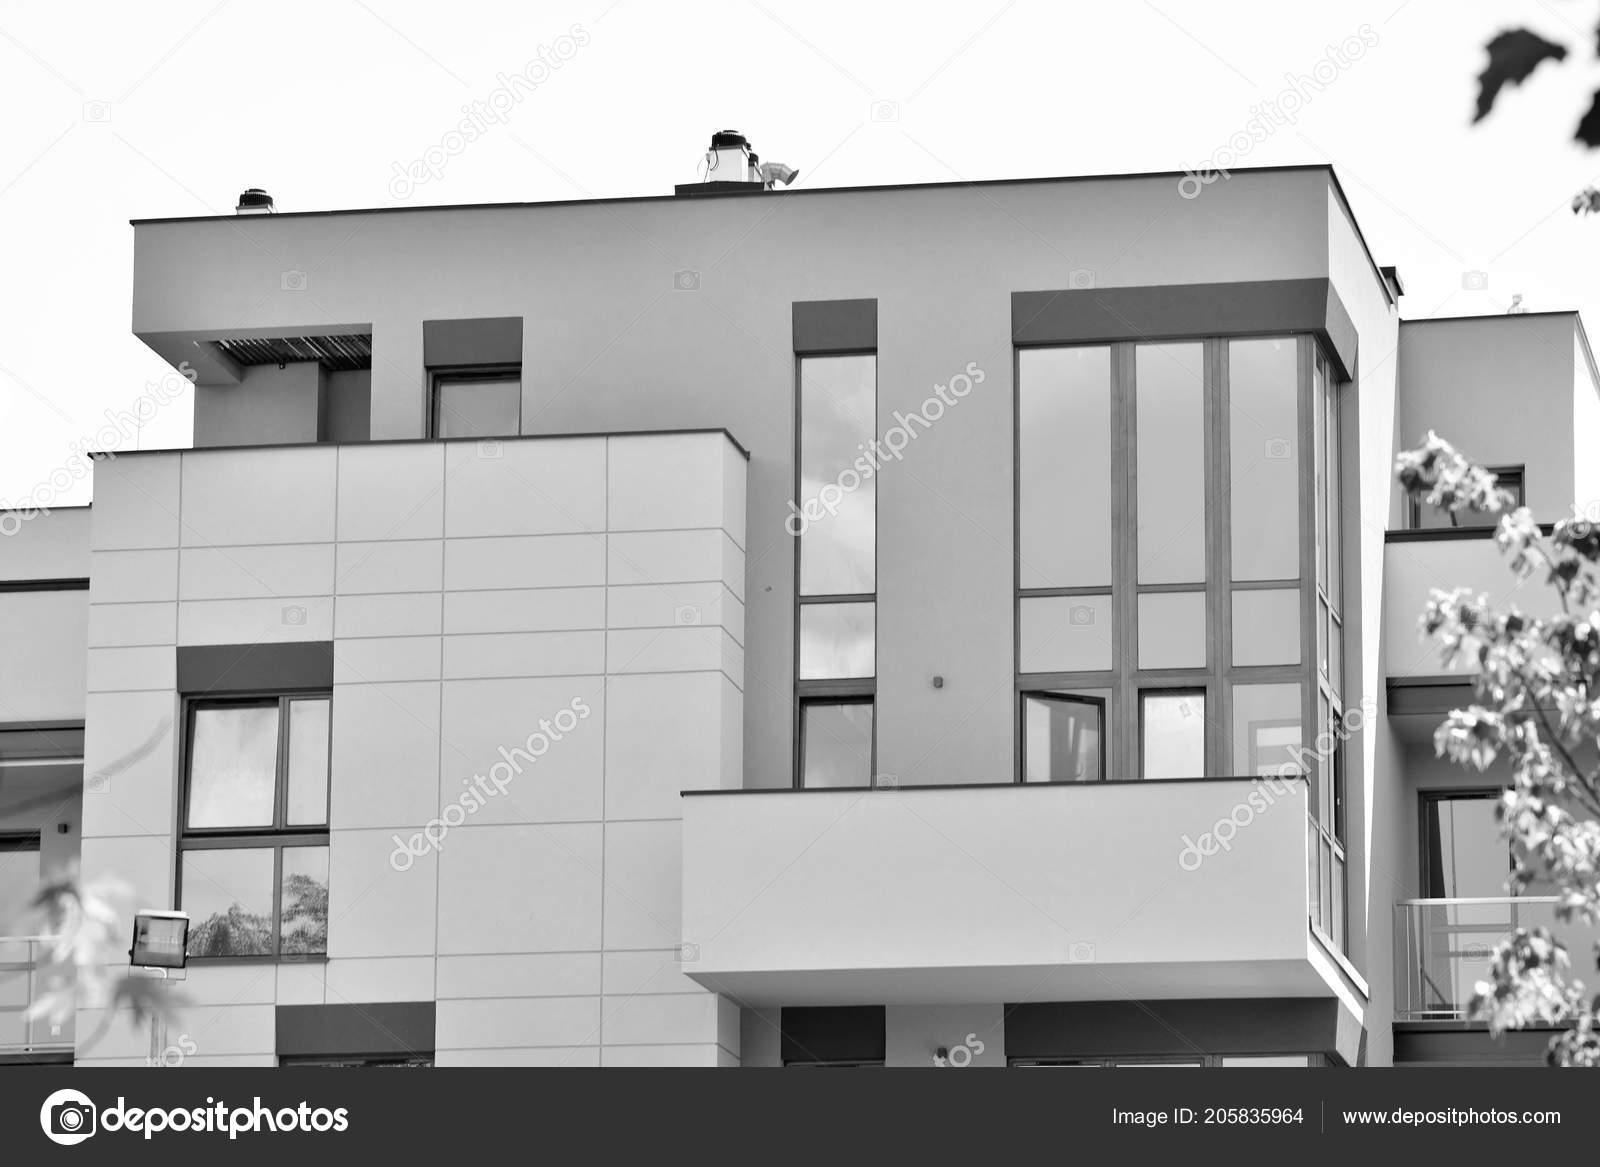 Zwart Wit Appartement : Modern appartement gebouw buitenkant zwart wit u2014 stockfoto © grand